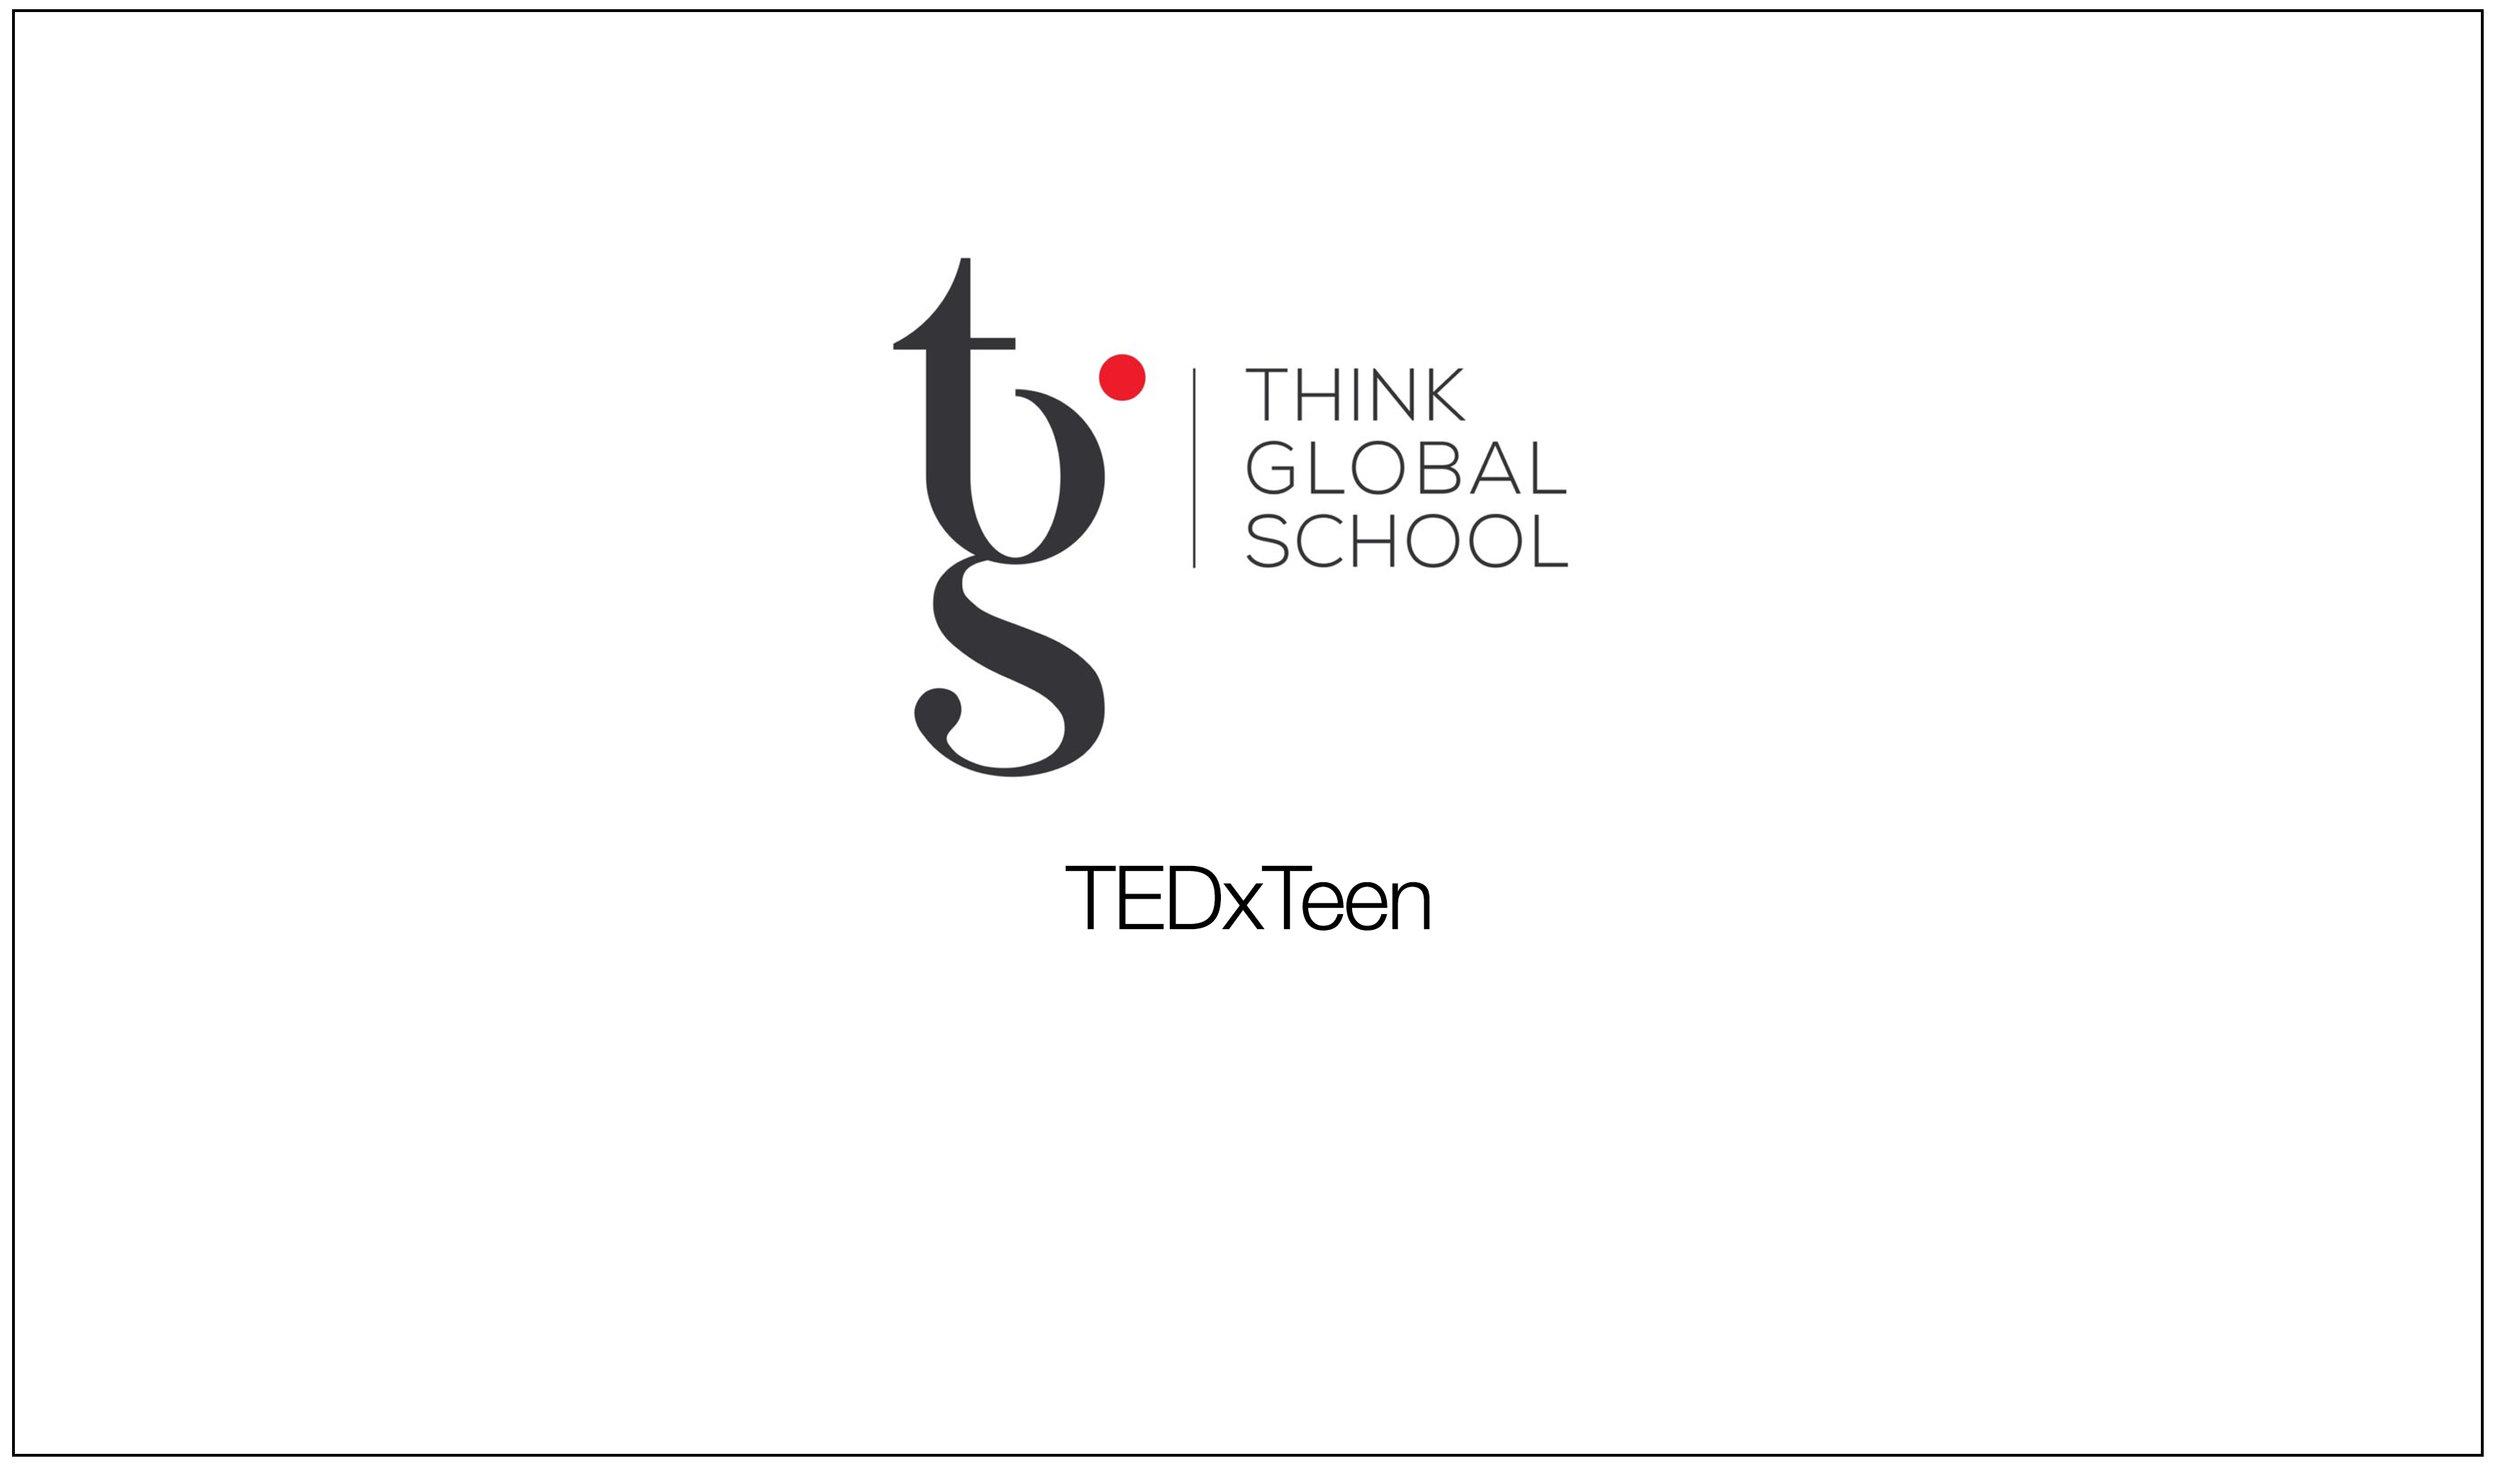 WAFFSite_Partner_ThinkGlobalSchool.jpg